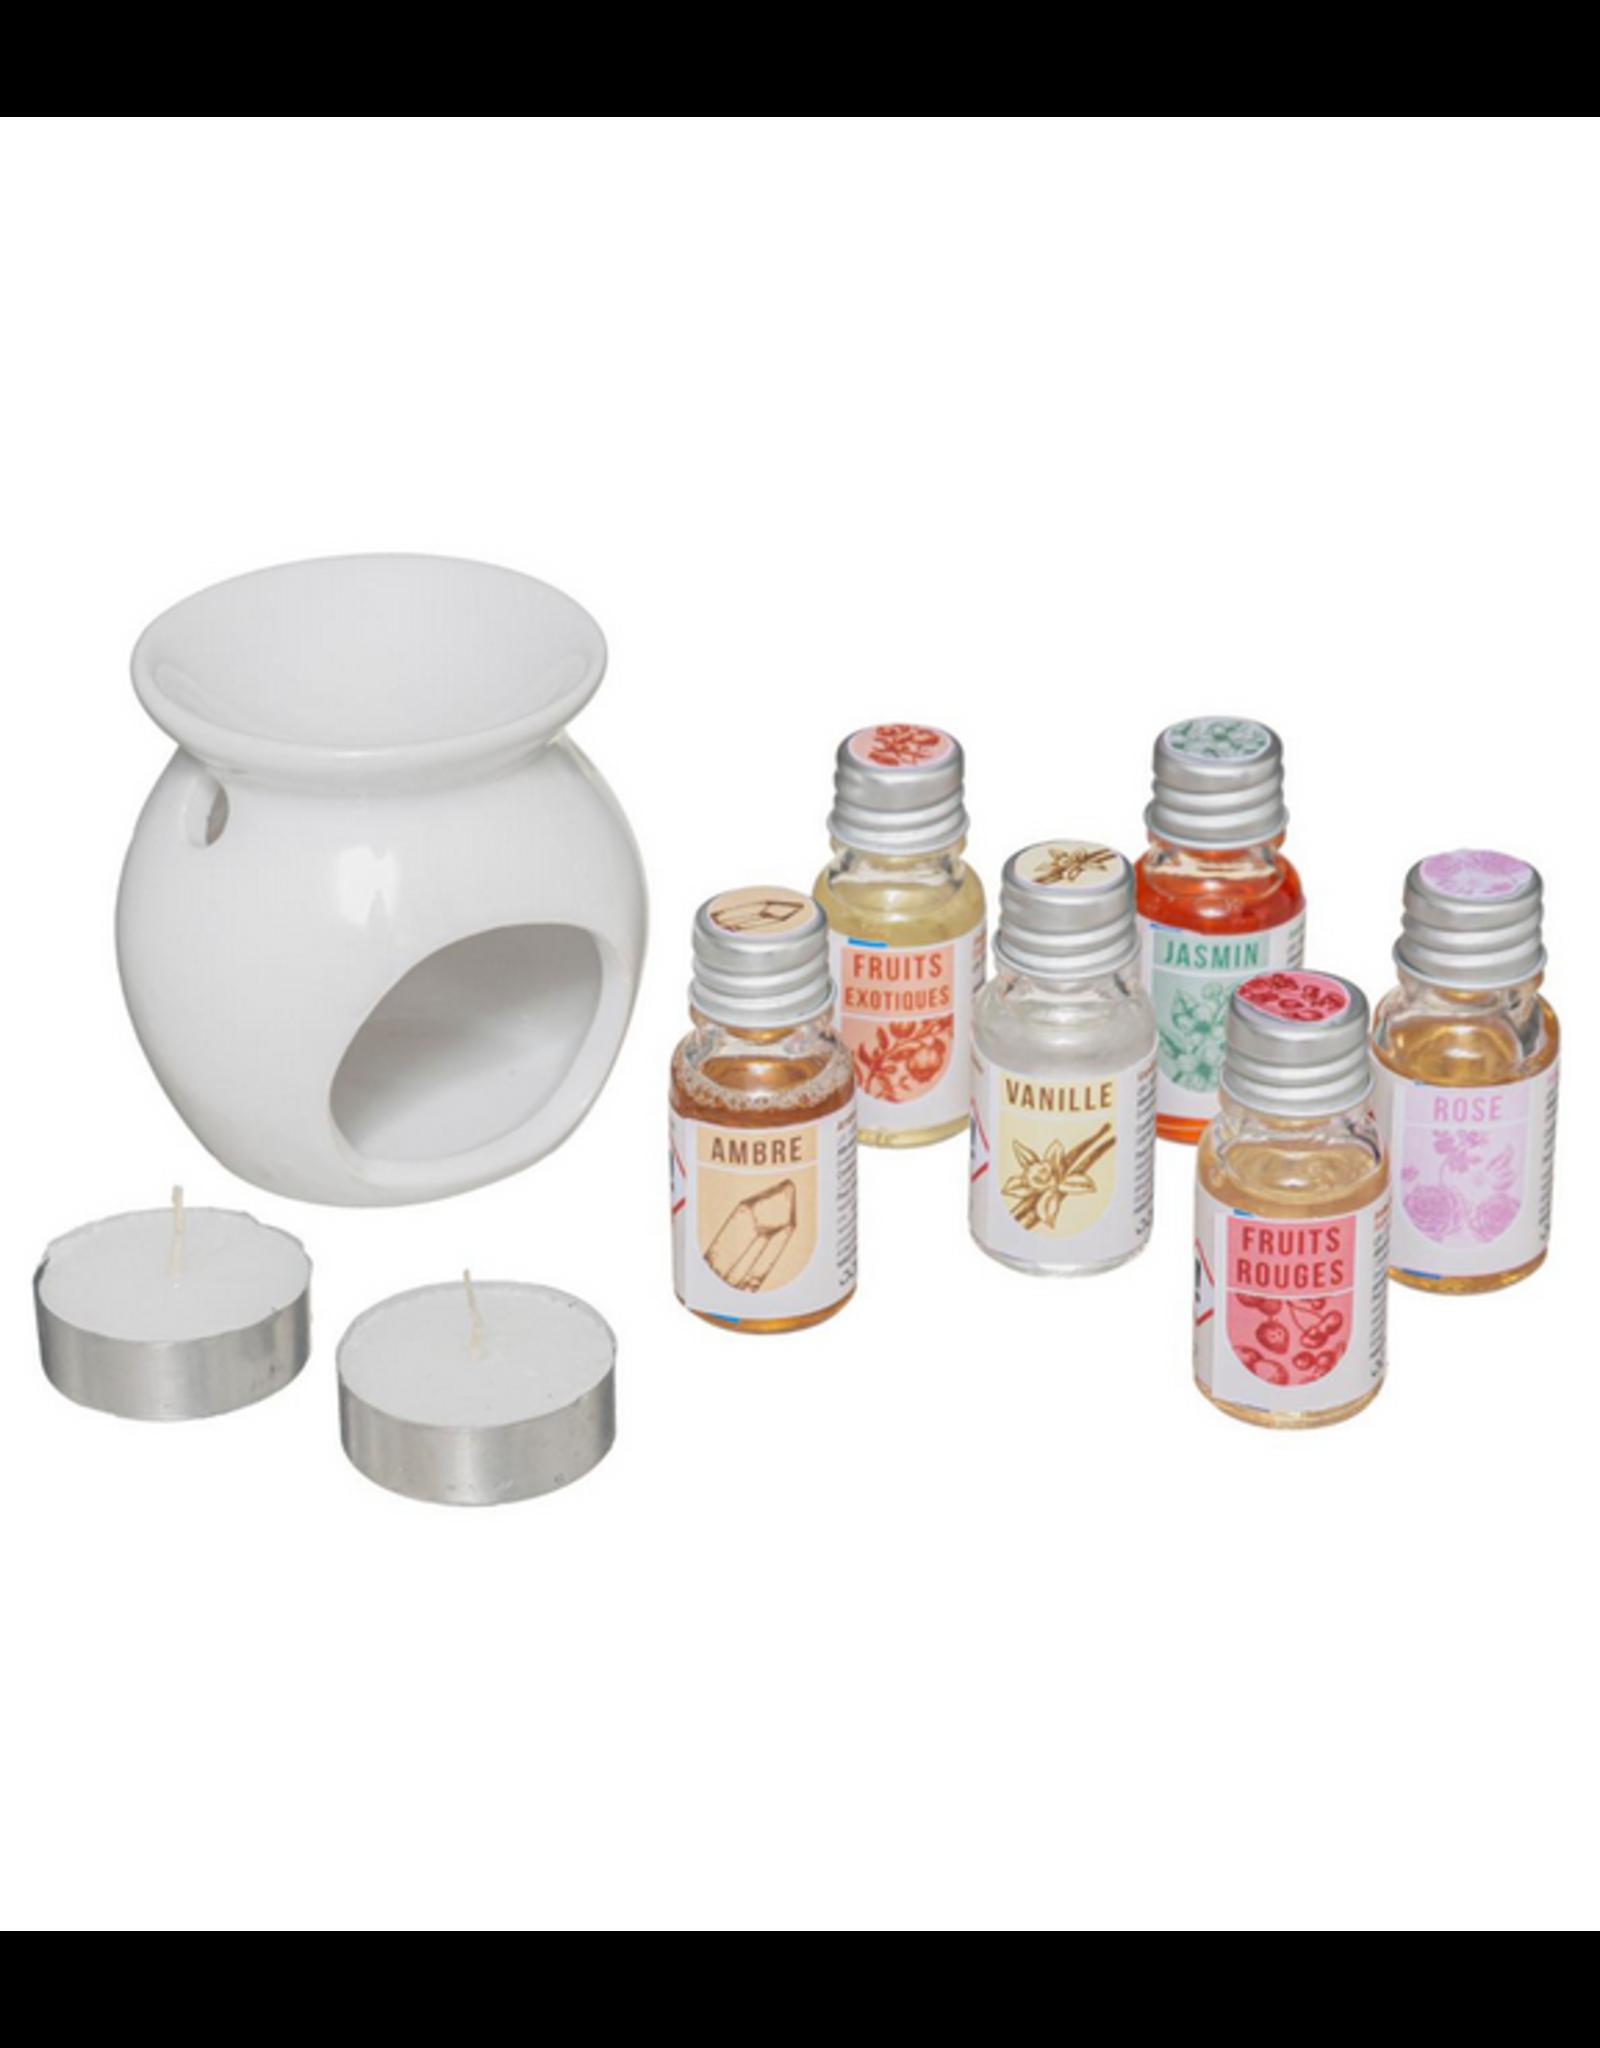 LOFT030 Oliebrander gifset | Houten Geurdoosje 1 Parfumbrander 6 Flesjes olie en 2 Kaarsen